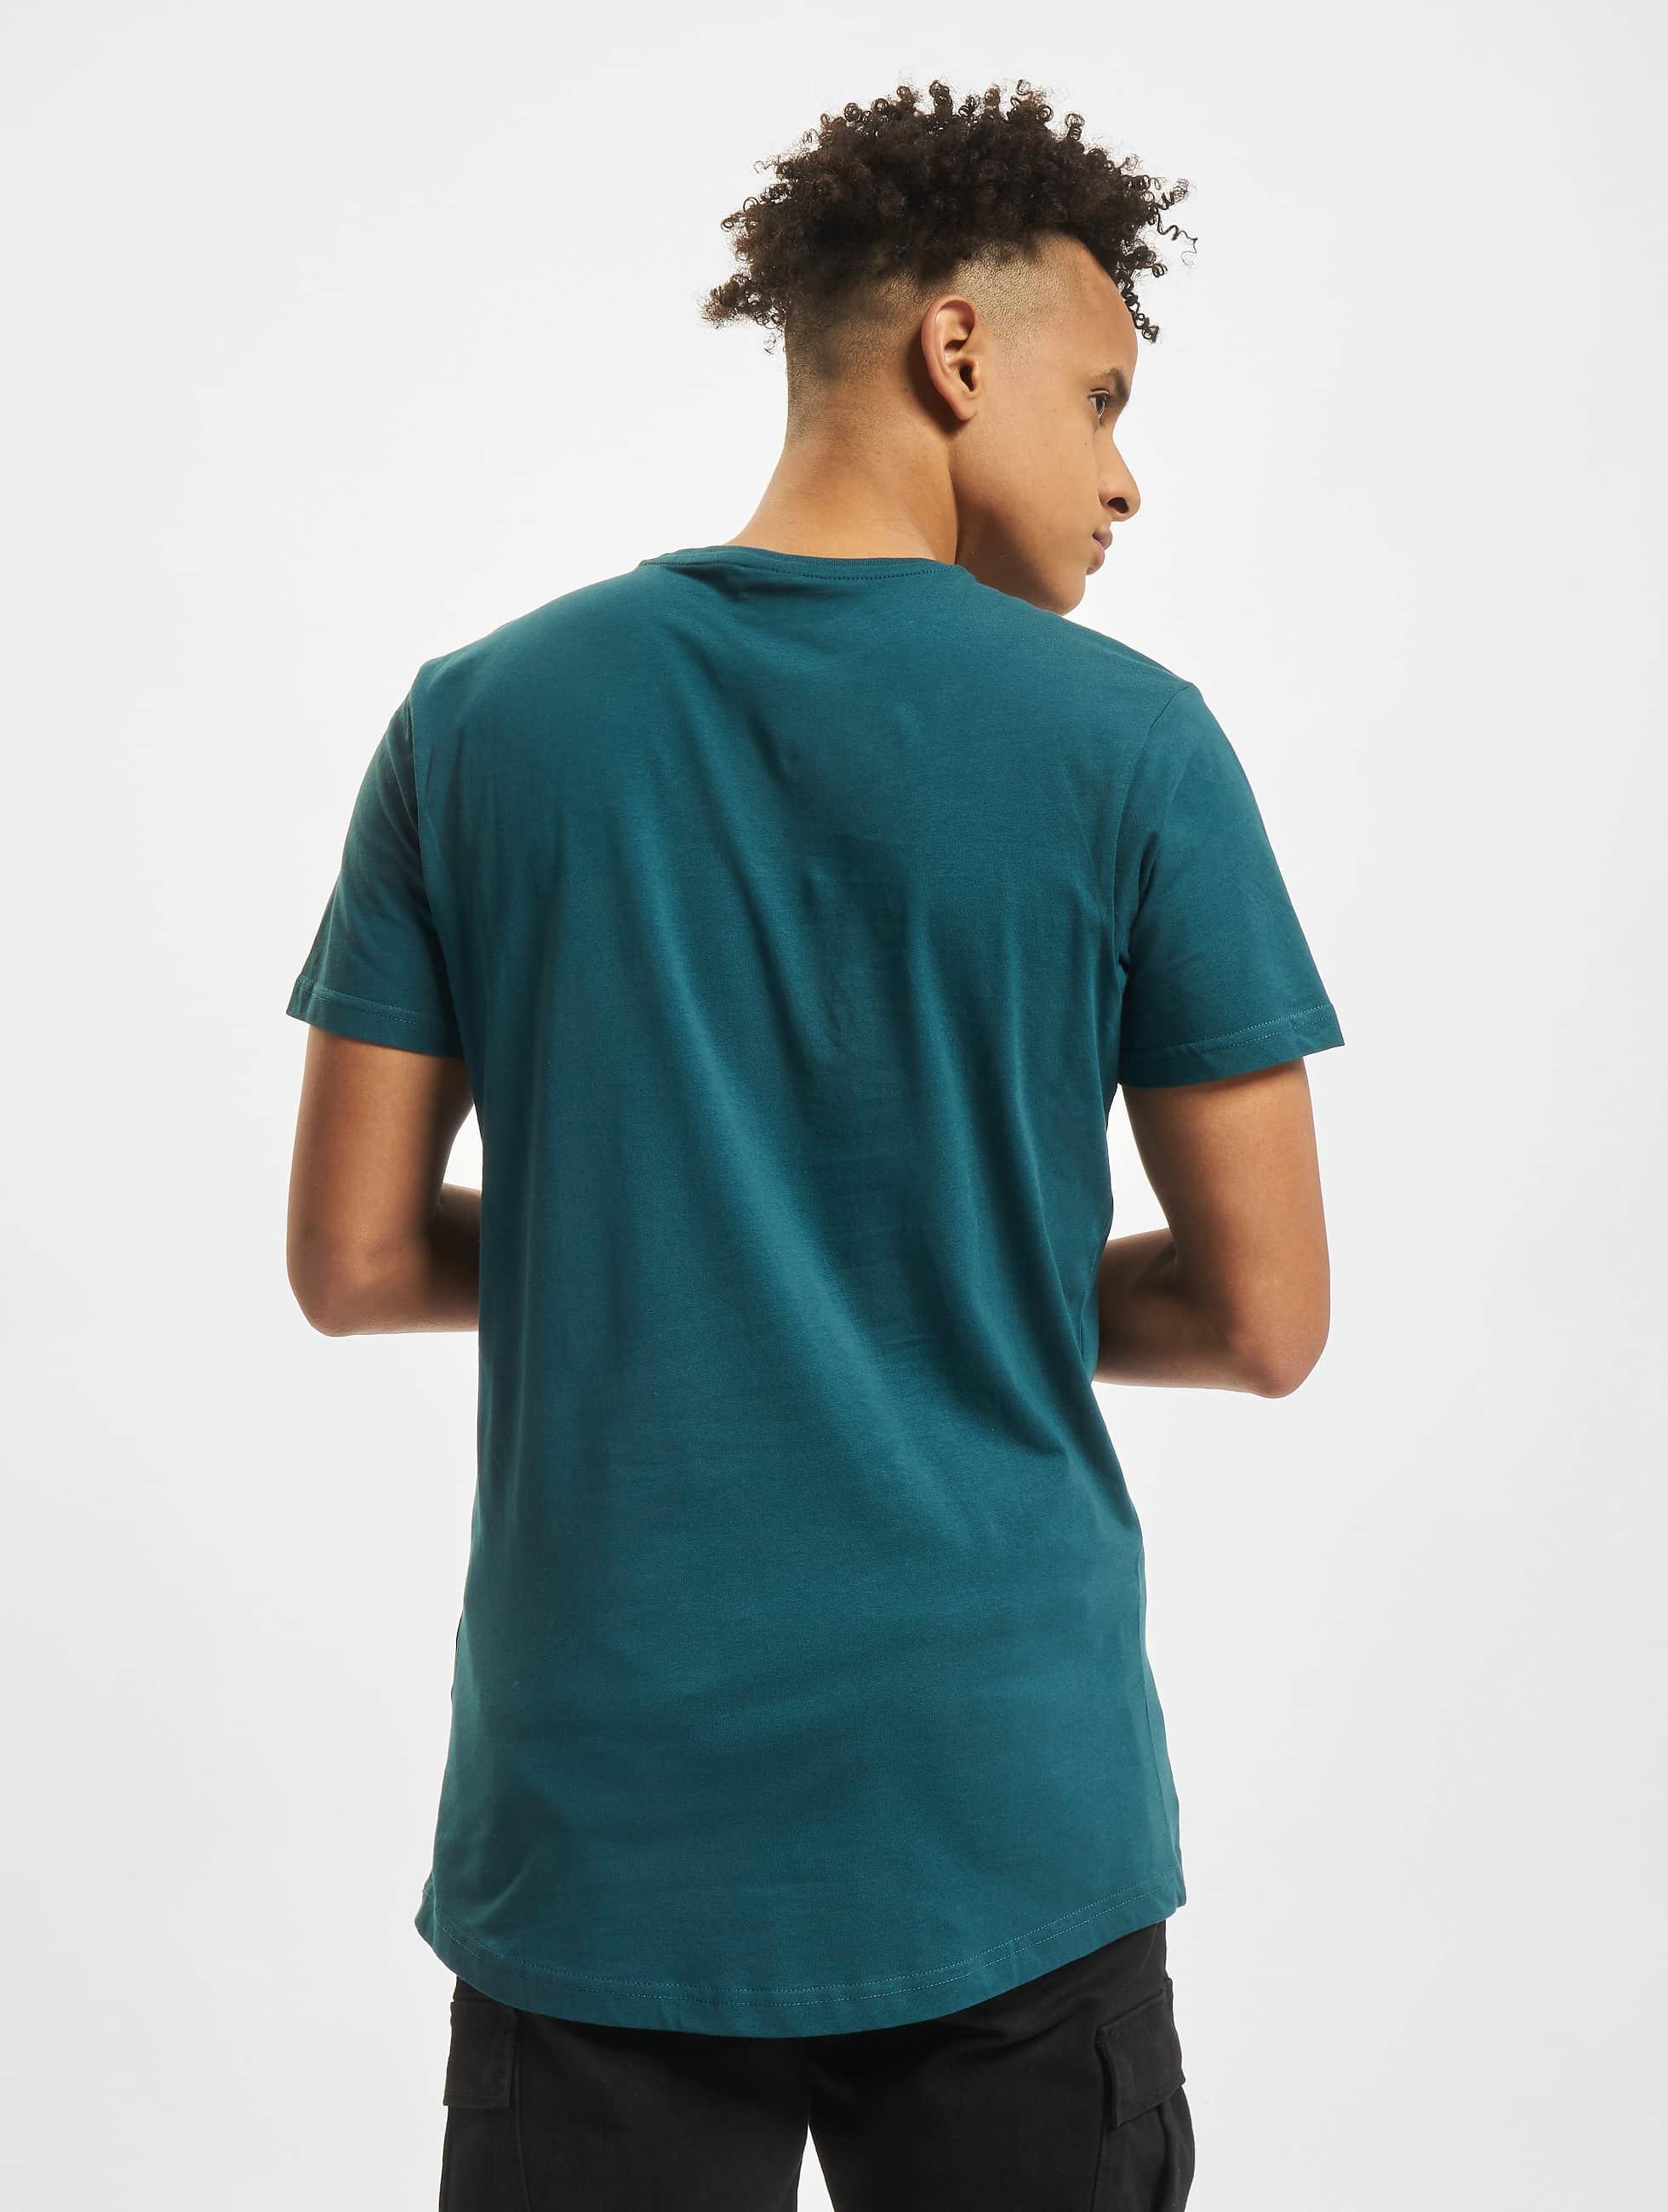 Urban Classics Tall Tees Shaped Oversized green